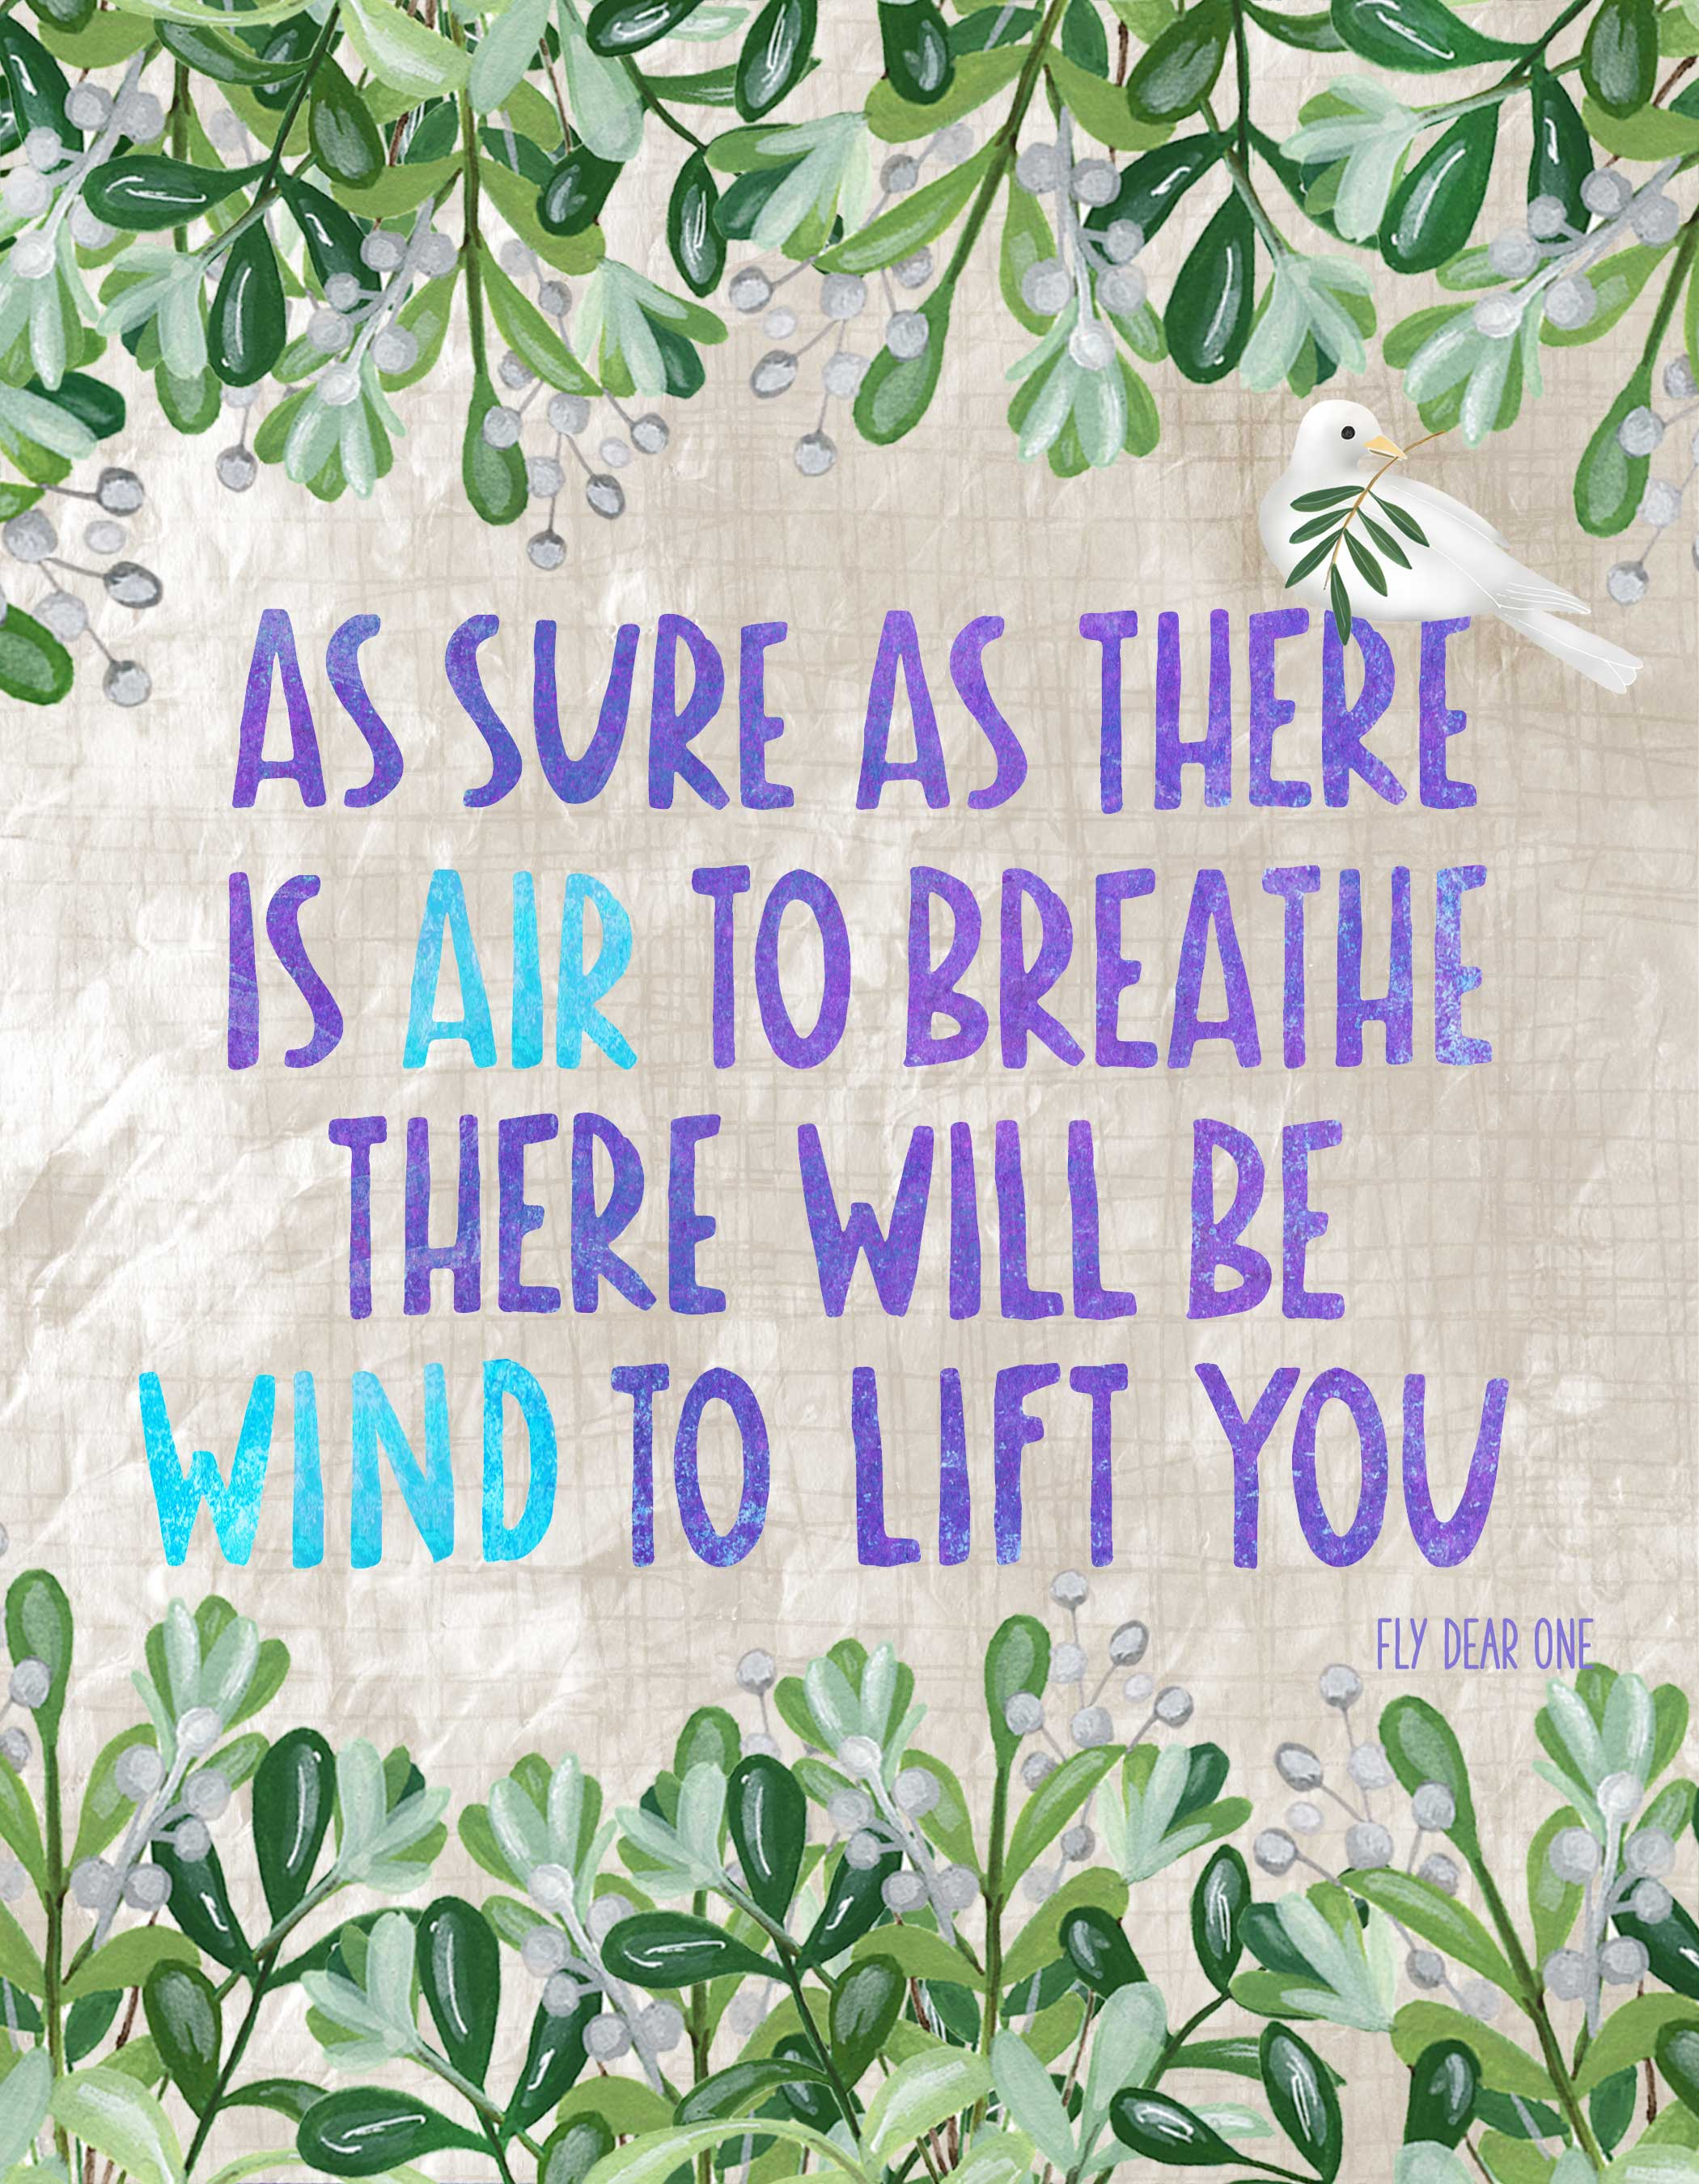 Elizatodd_wind-to-lift-you.jpg